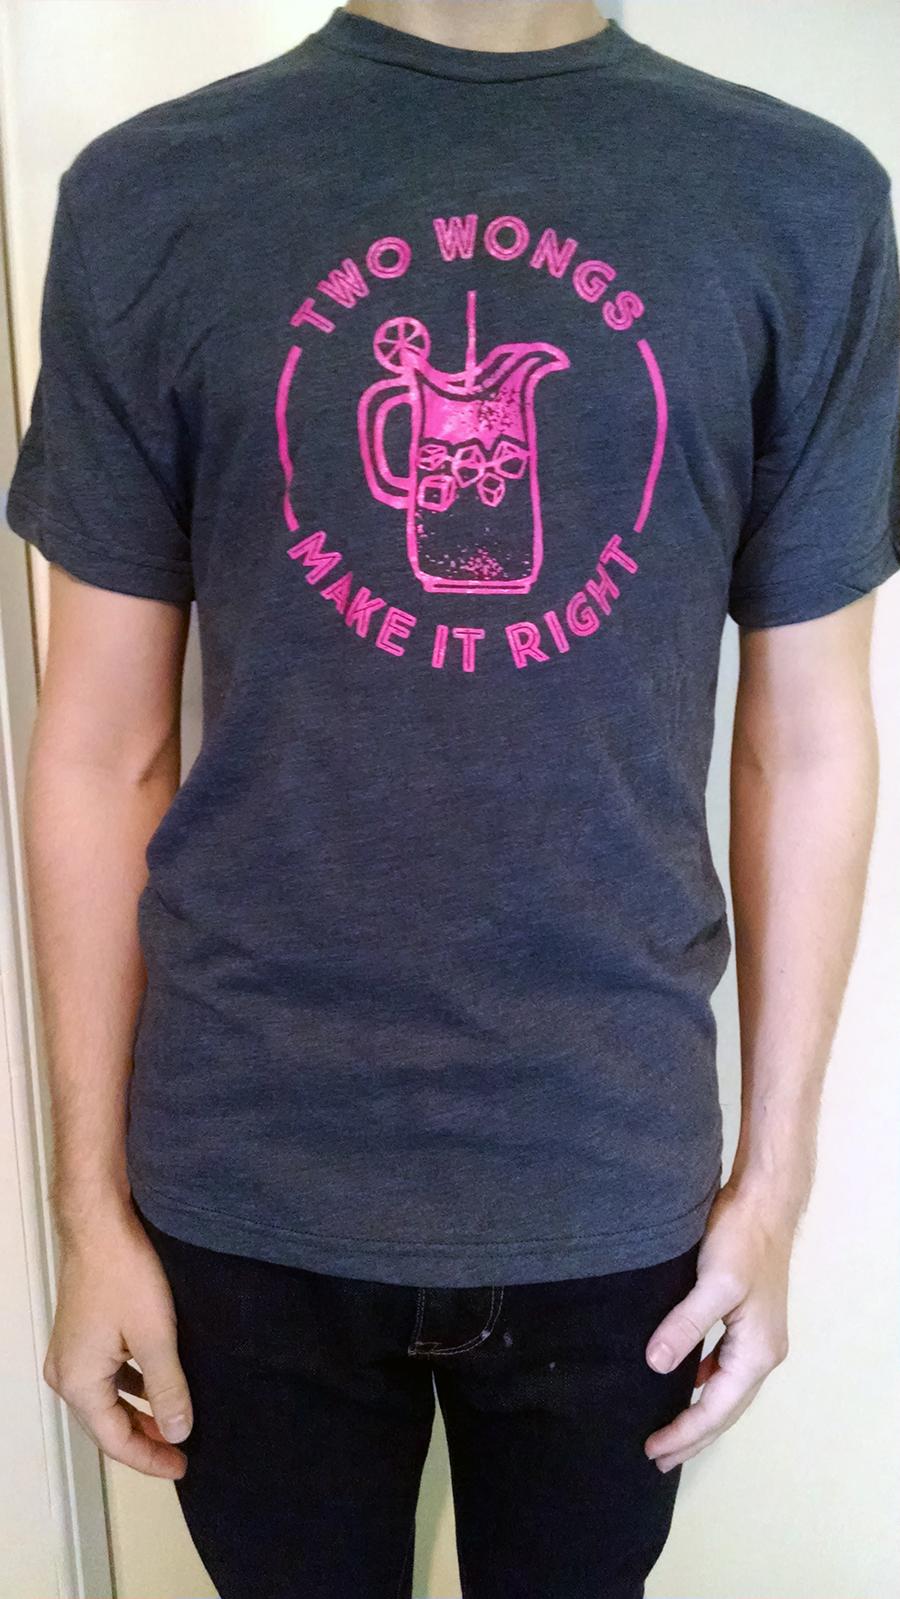 Two Wongs Make it Right T-Shirt, Mens